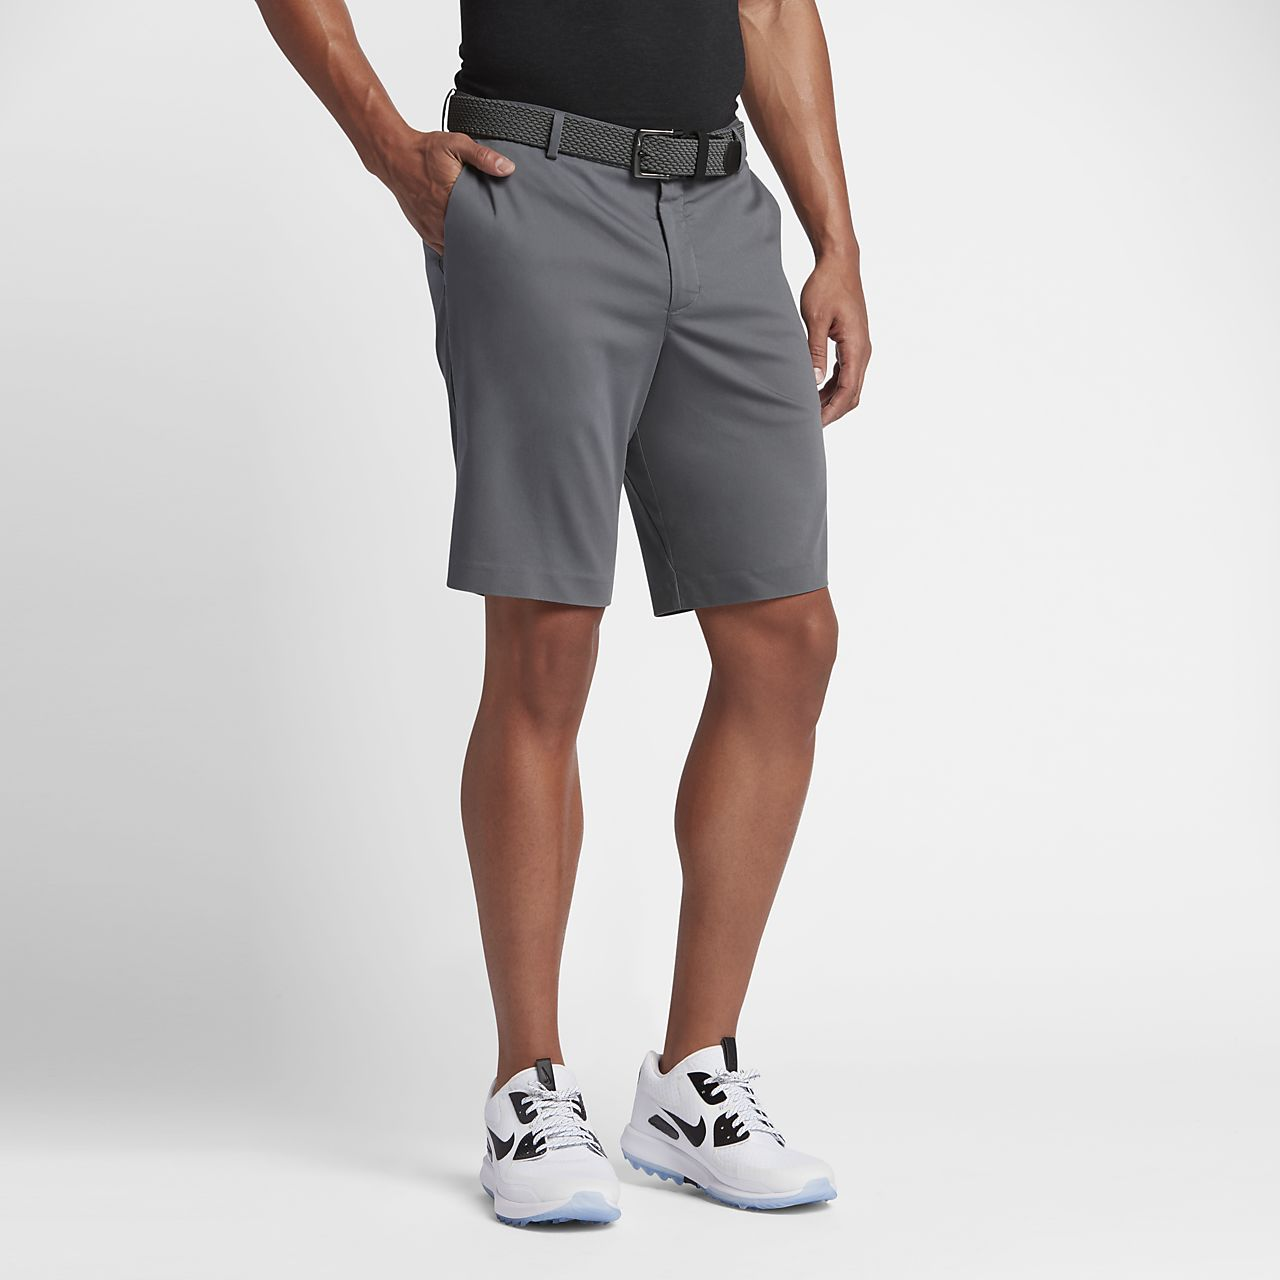 Nike Flex Short Slim Washed Men's Golf Shorts